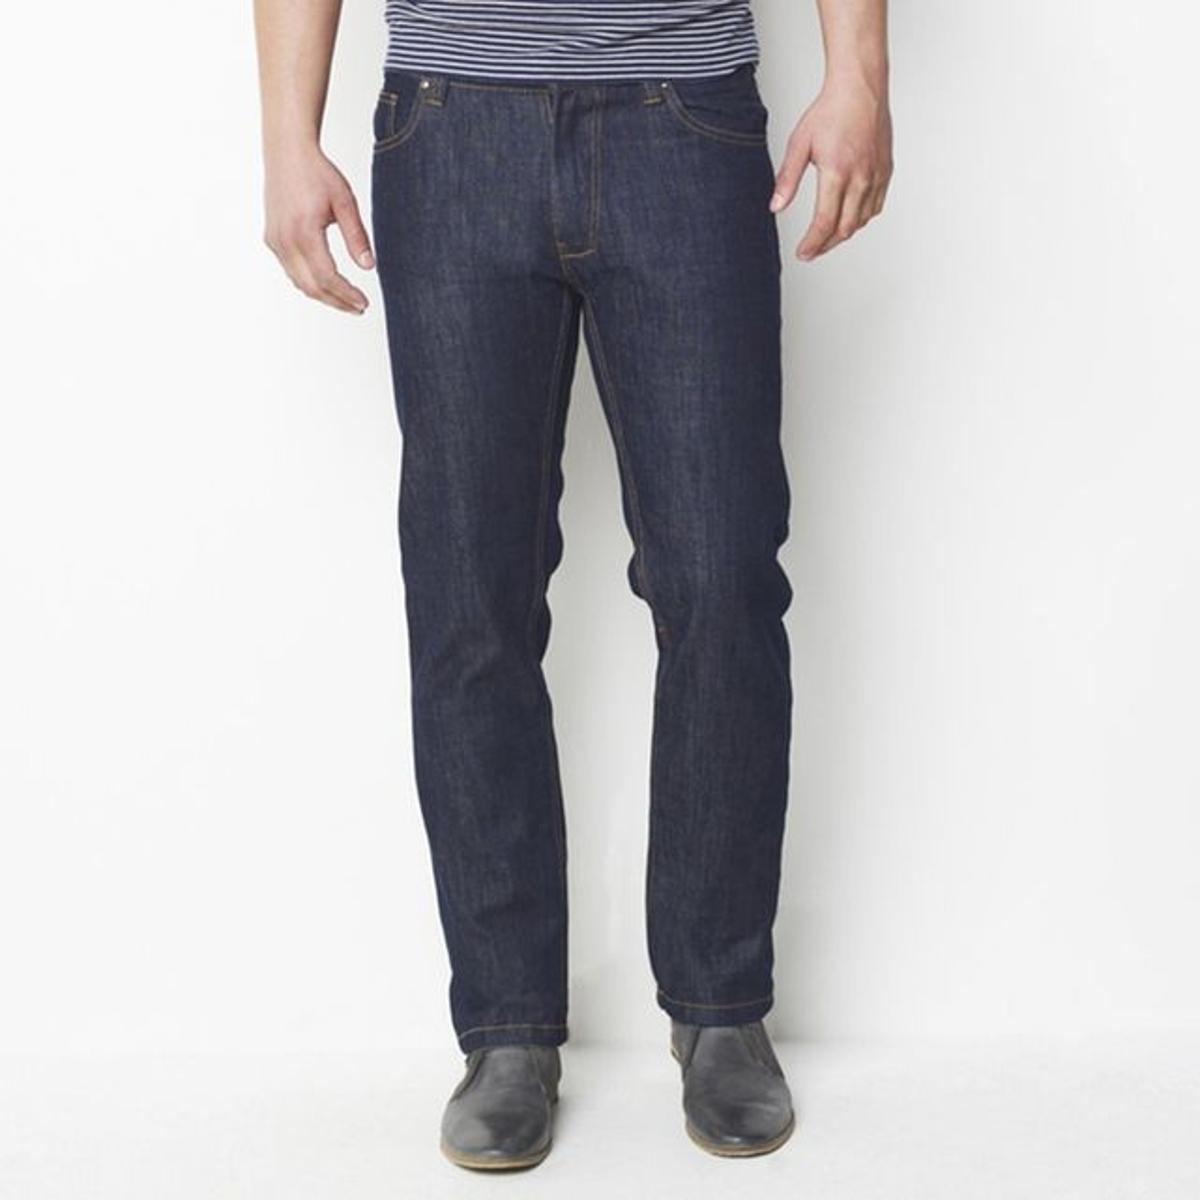 jean 5 poches regular (coupe droite)